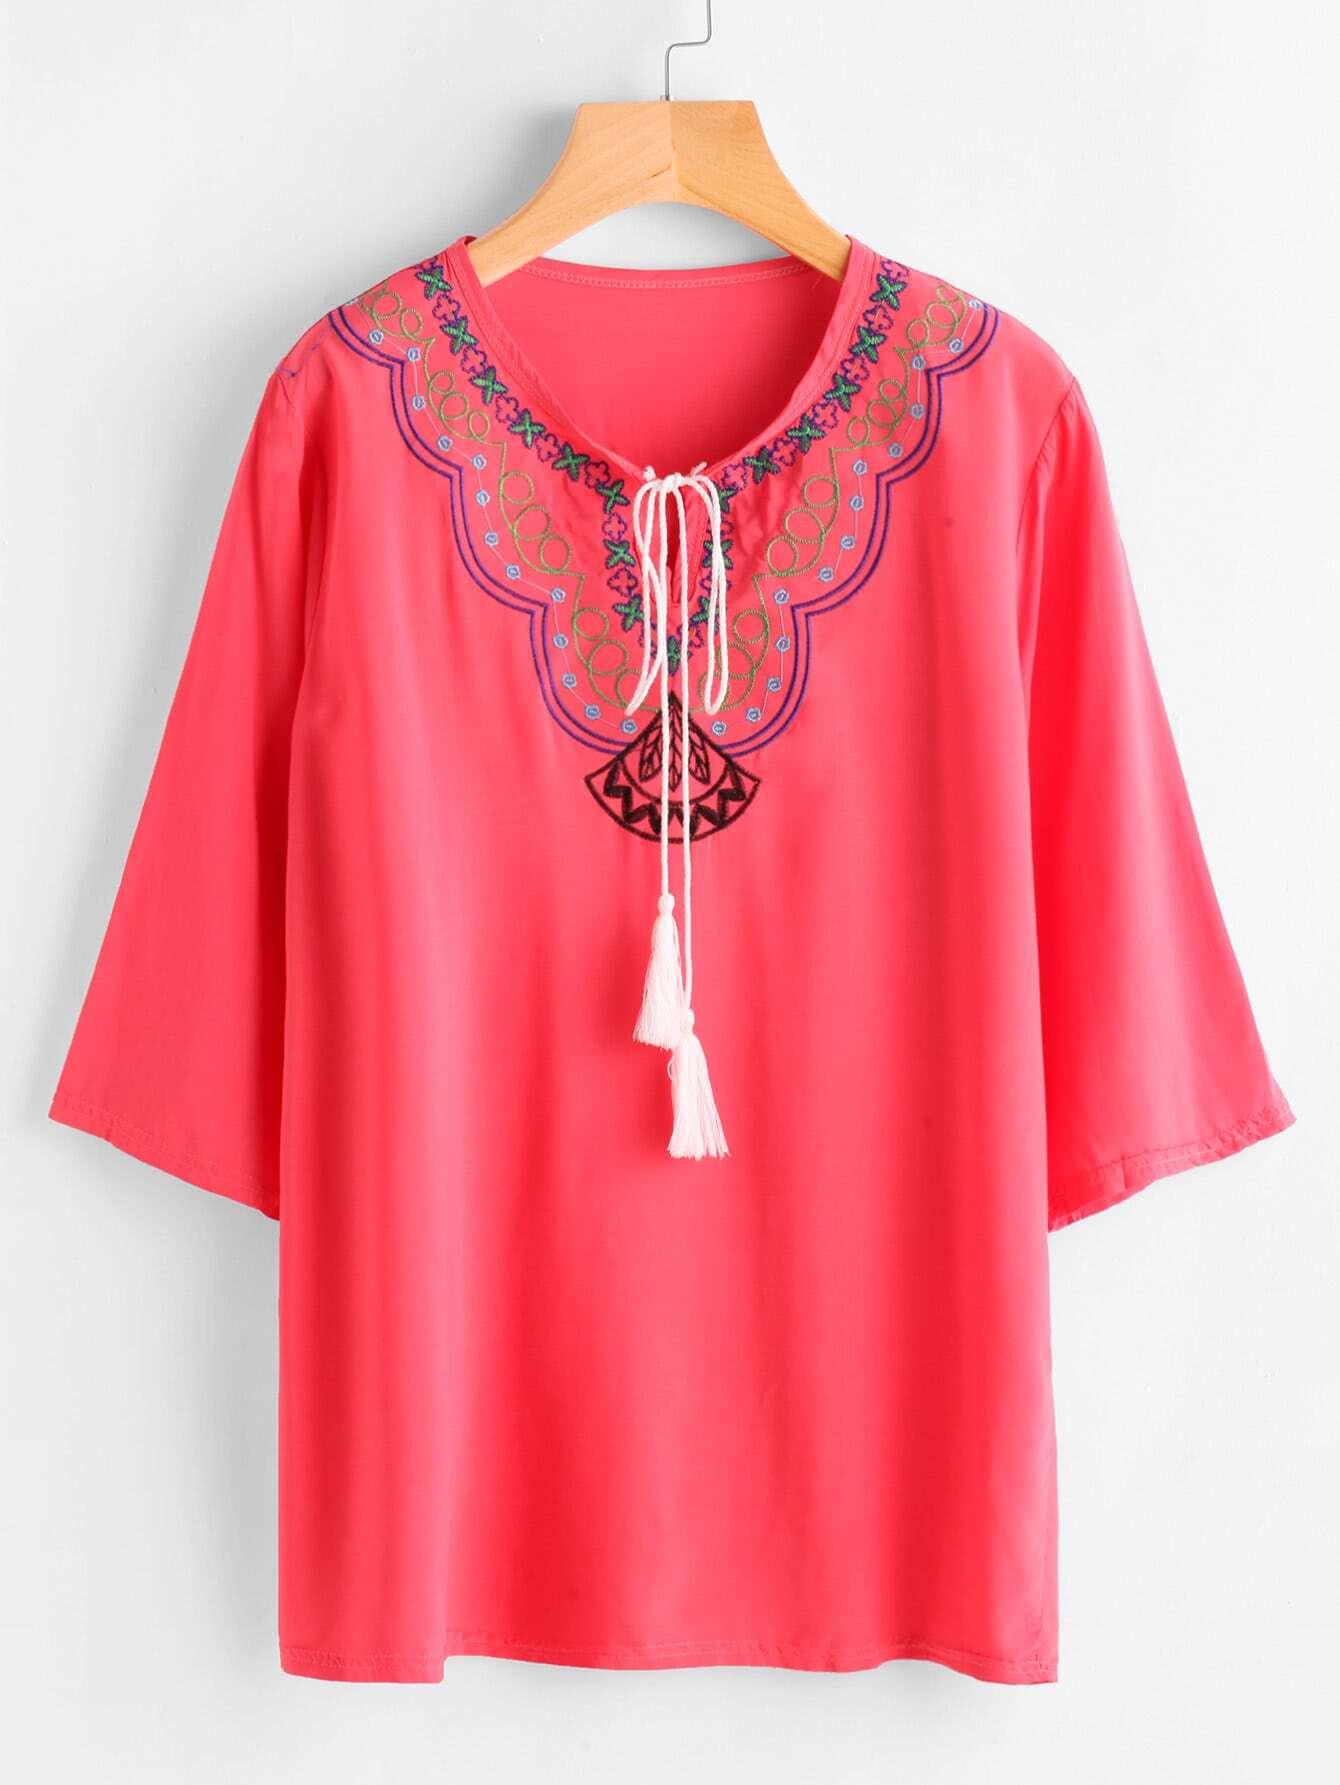 Tassel Tie Neck Embroidery Blouse -SheIn(Sheinside)